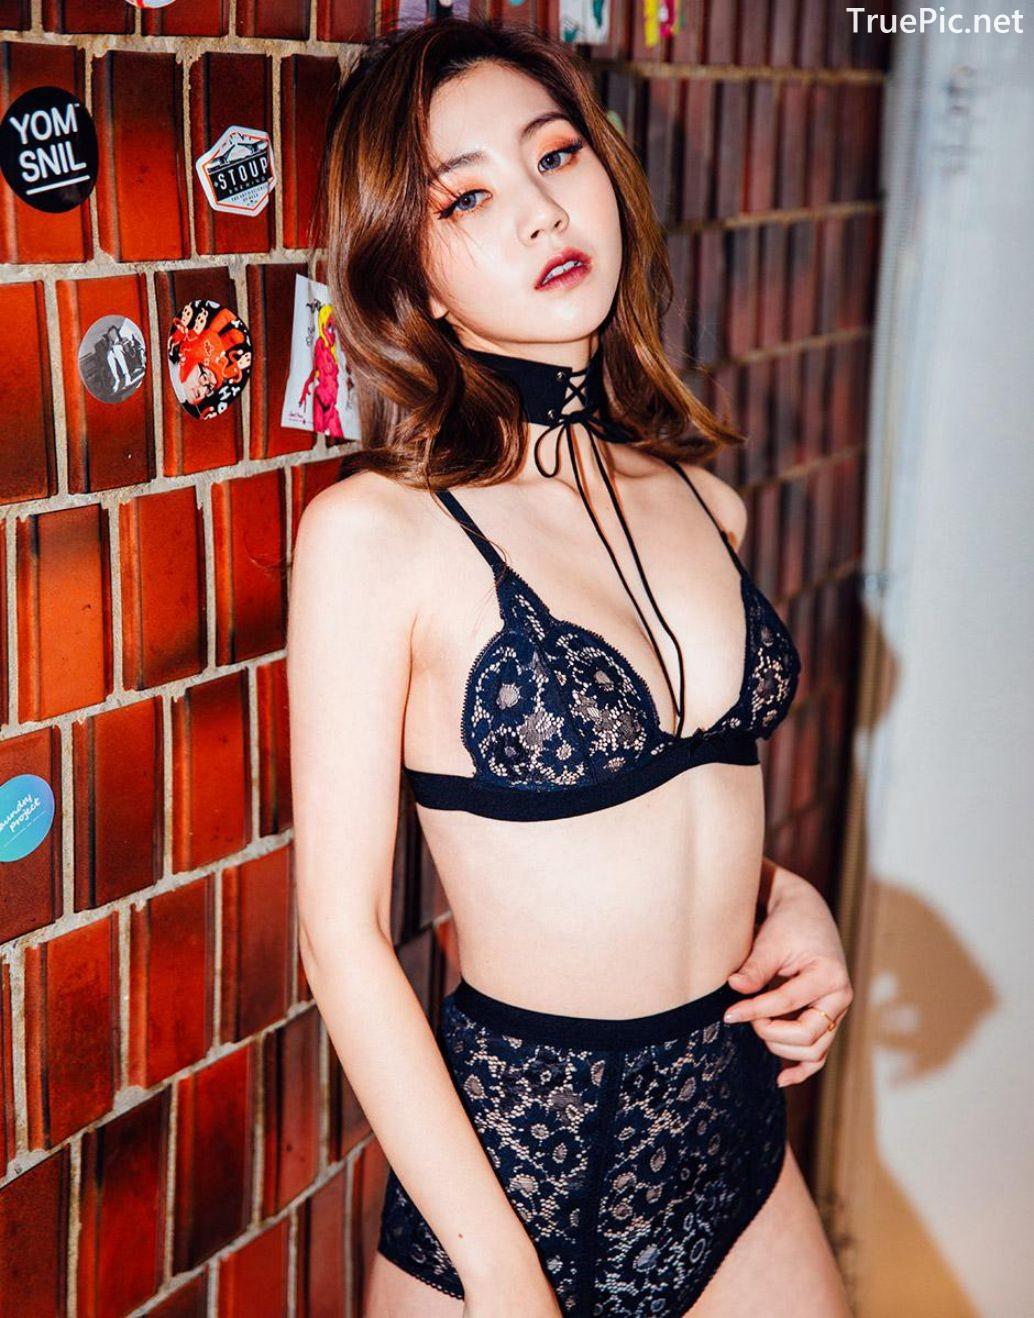 Image-Korean-Fashion-Model–Lee-Chae-Eun–For-Love-and-Lemons-Lingerie-Set-TruePic.net- Picture-2